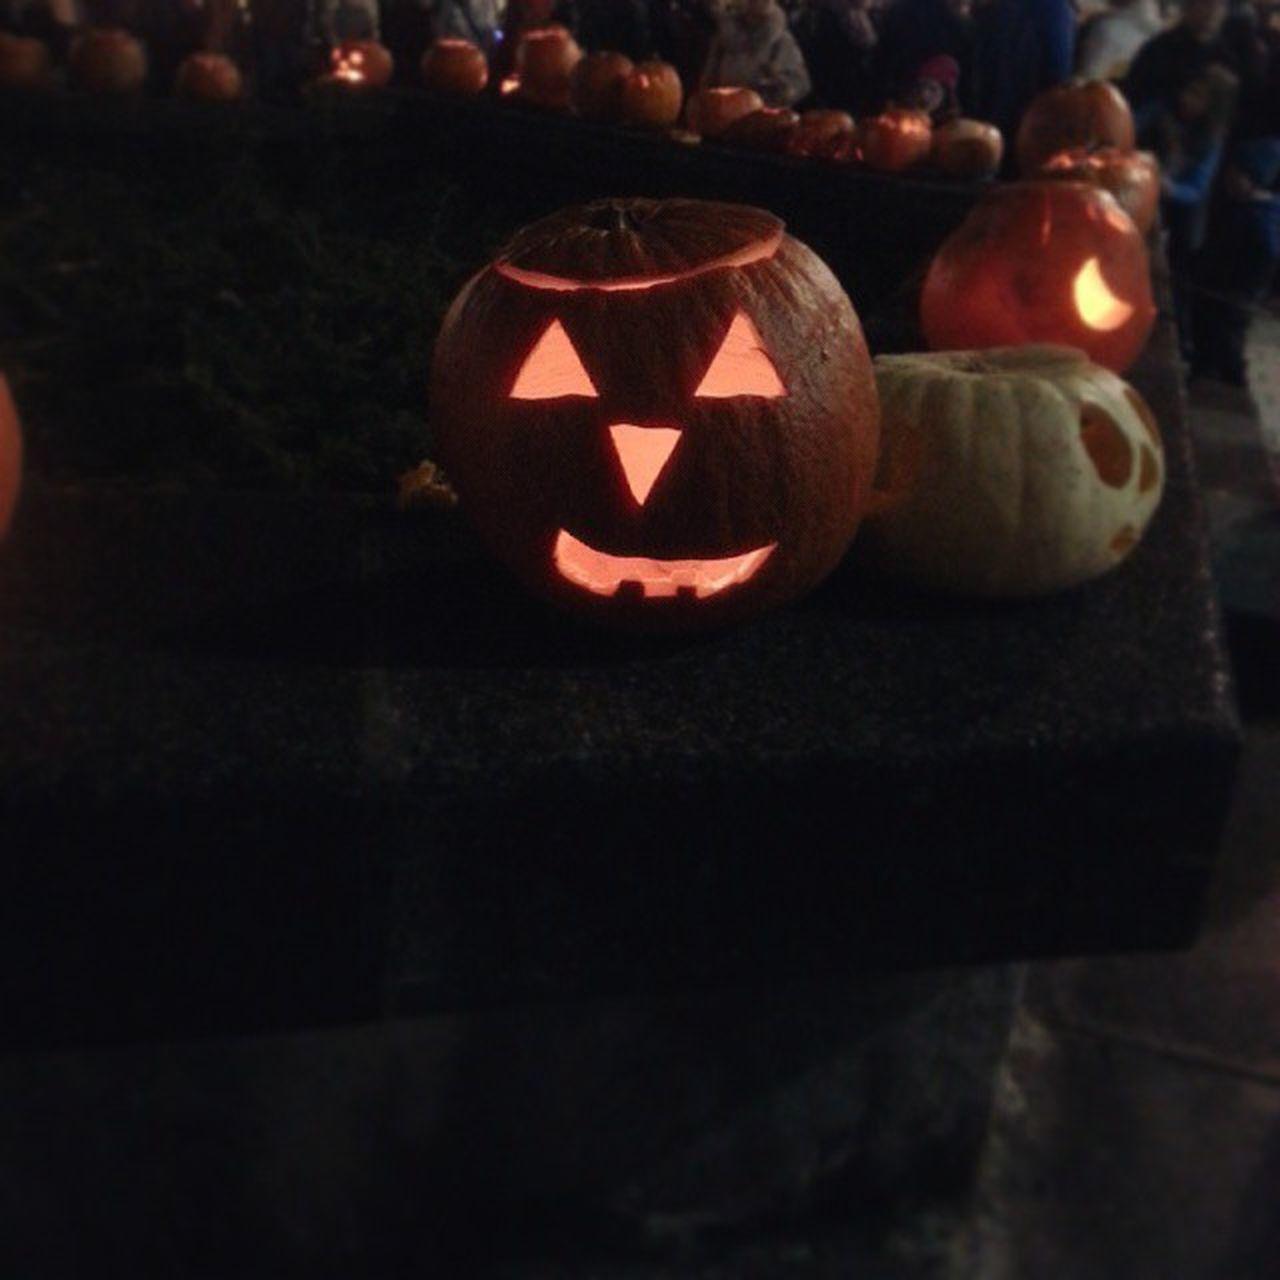 pumpkin, celebration, halloween, jack o lantern, tradition, holiday - event, illuminated, anthropomorphic face, night, cultures, no people, indoors, lantern, close-up